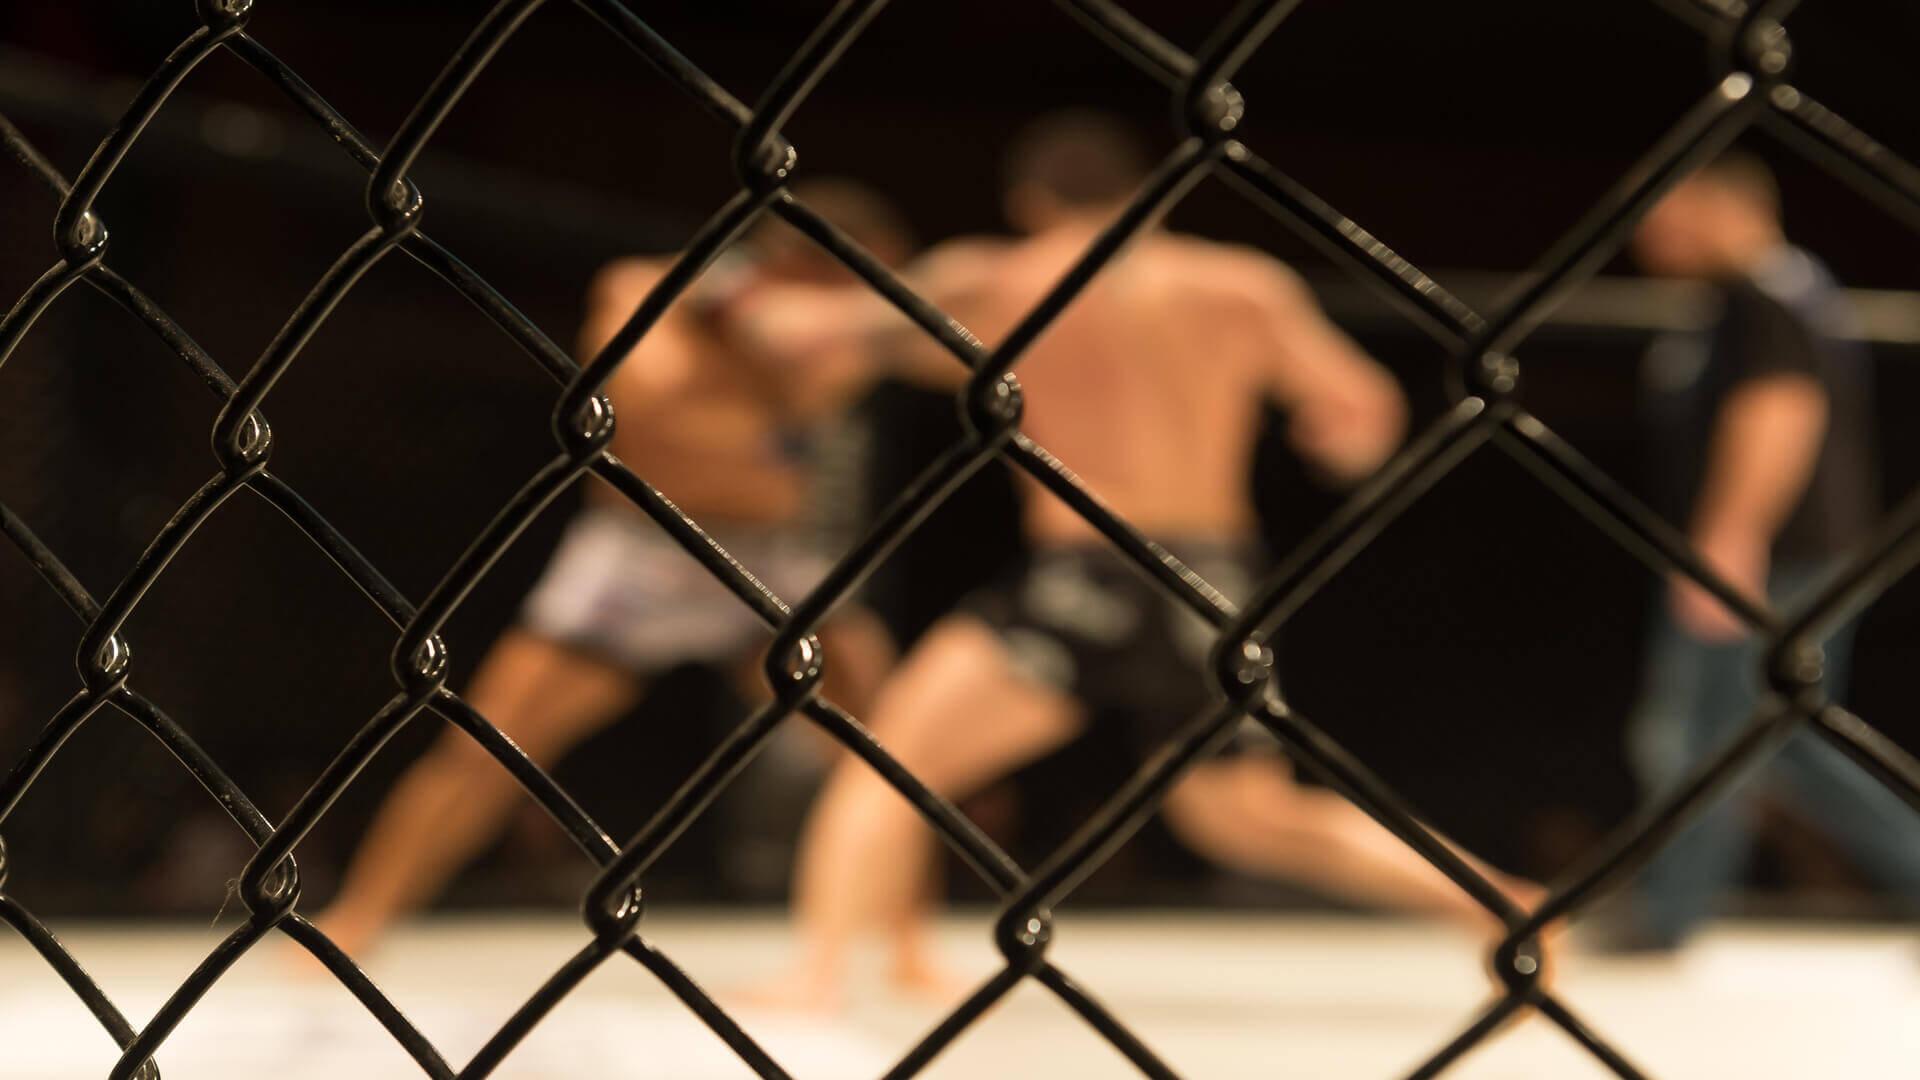 Walka MMA w klatce - mieszane sztuki walki